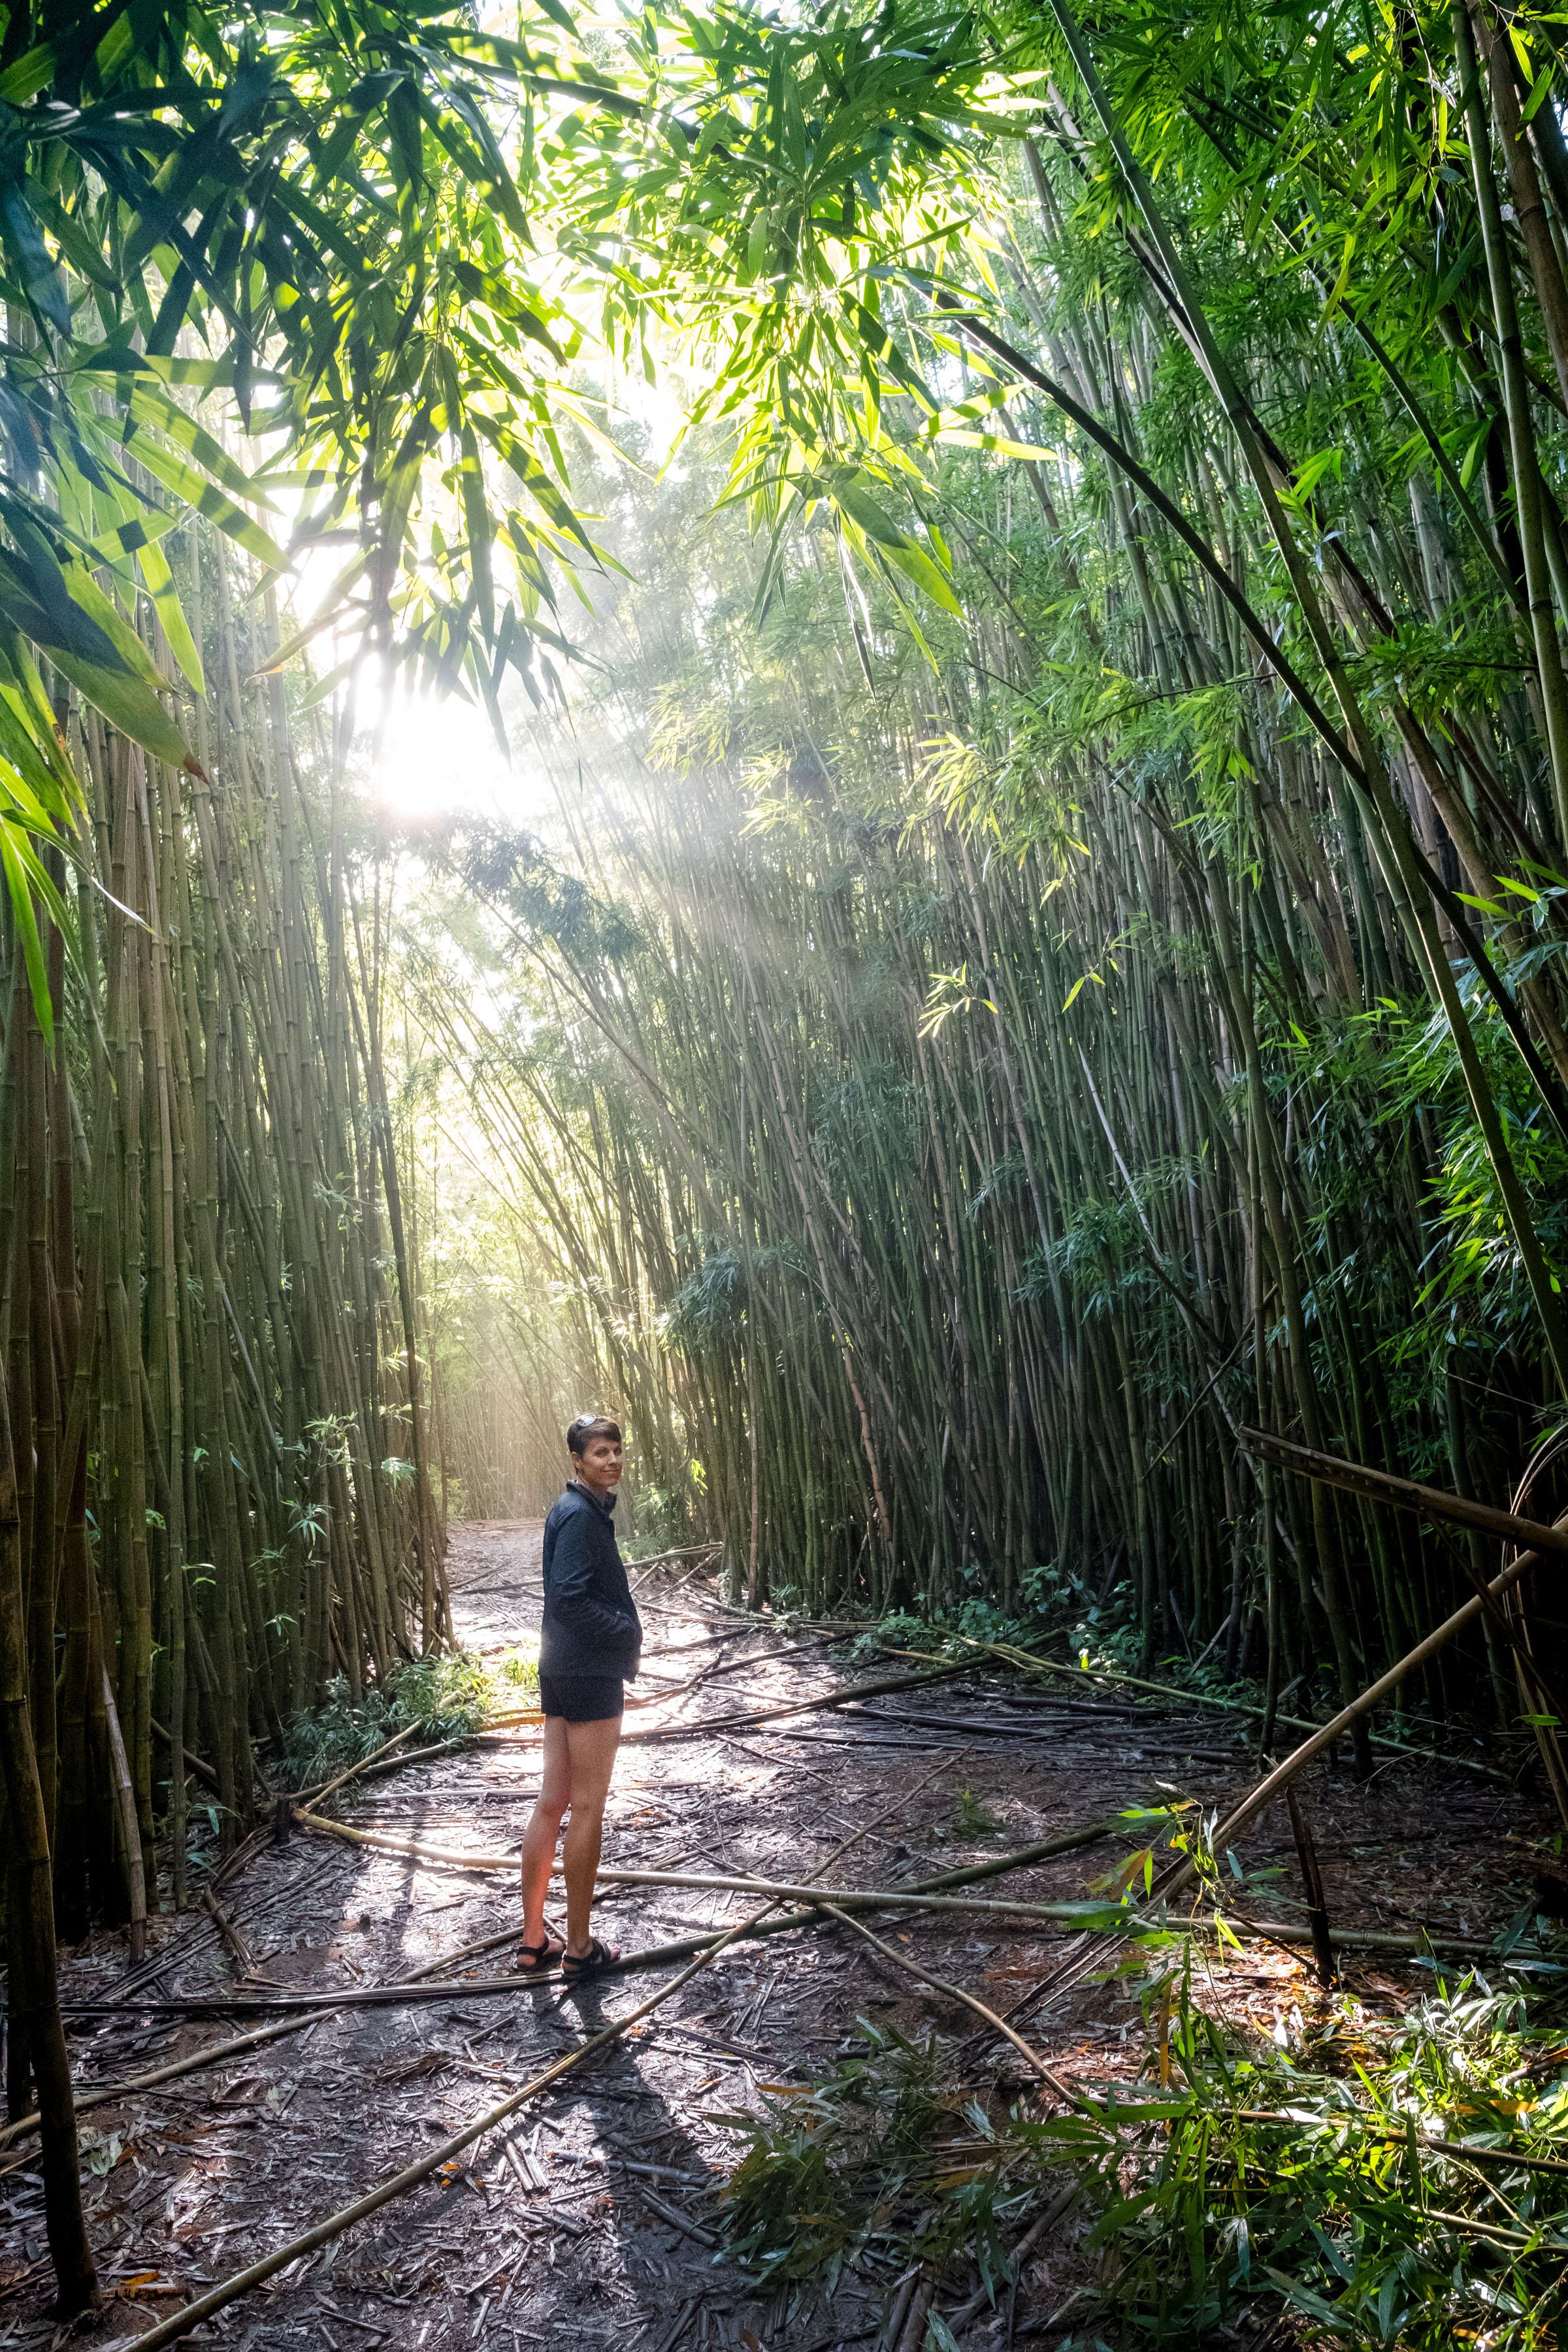 DSCF2570_Bamboo Forest.jpg